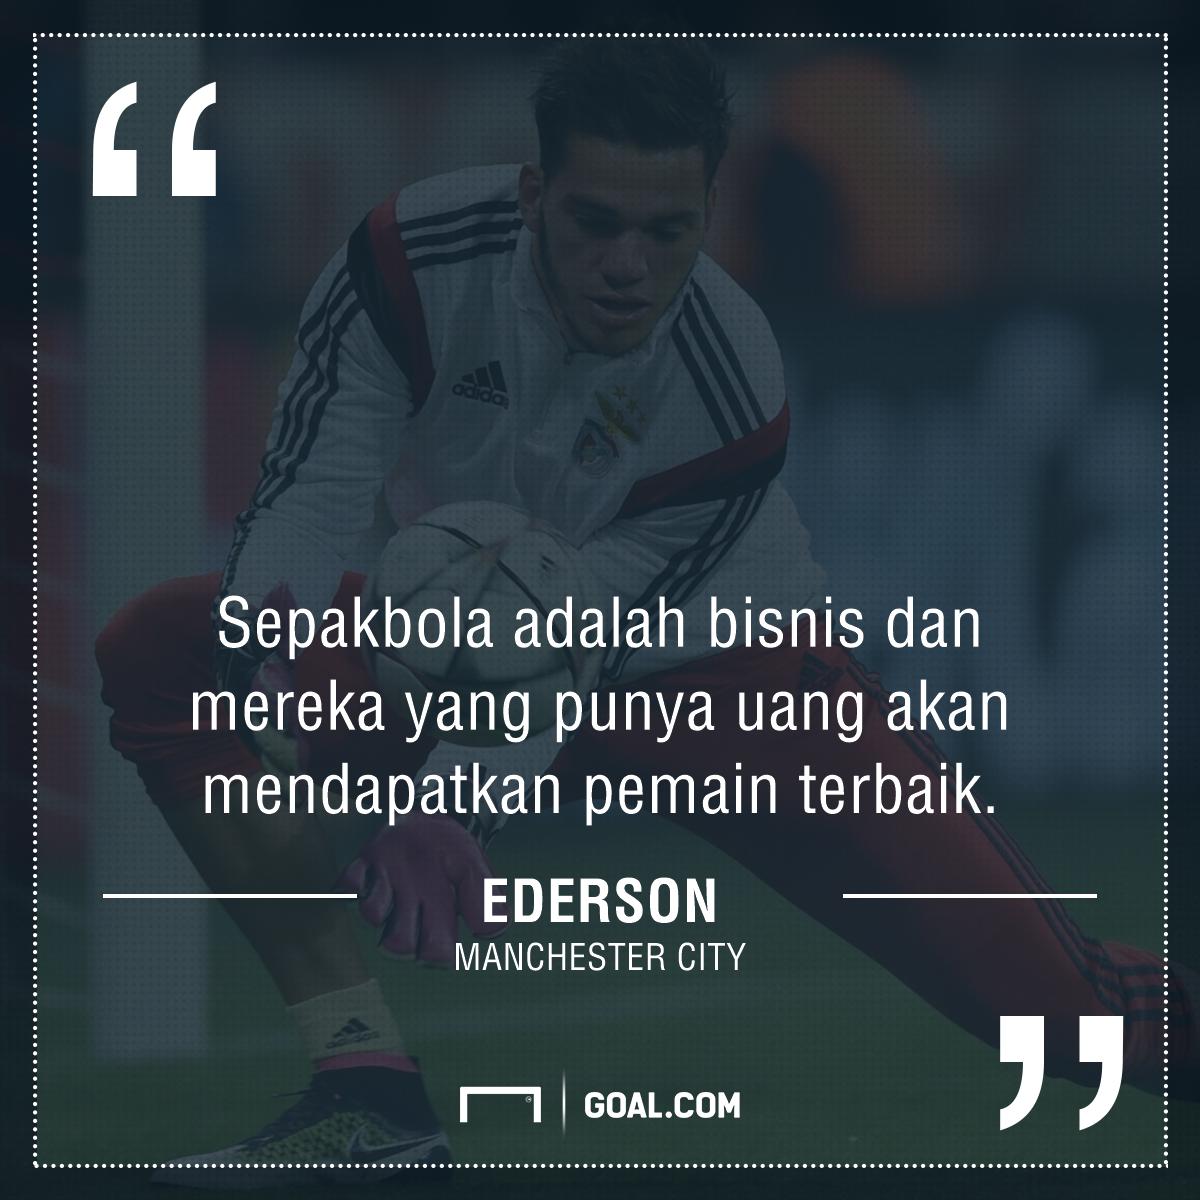 GFXID Ederson - Manchester City